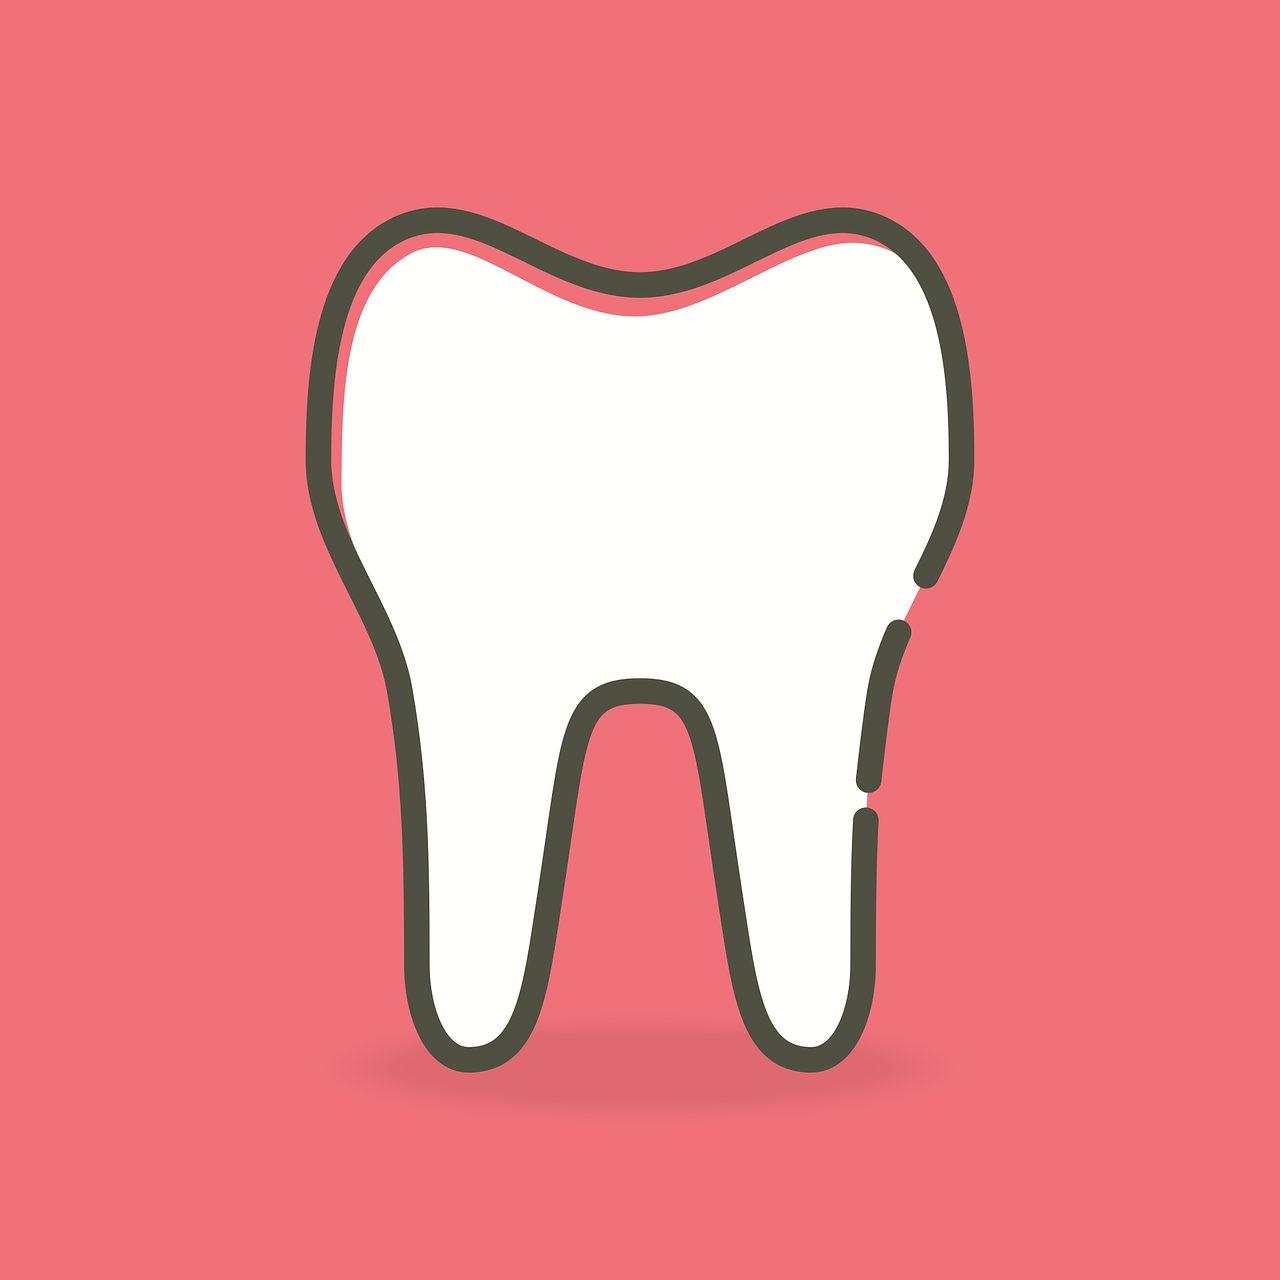 Goudswaard Tandartspraktijk E A tandarts